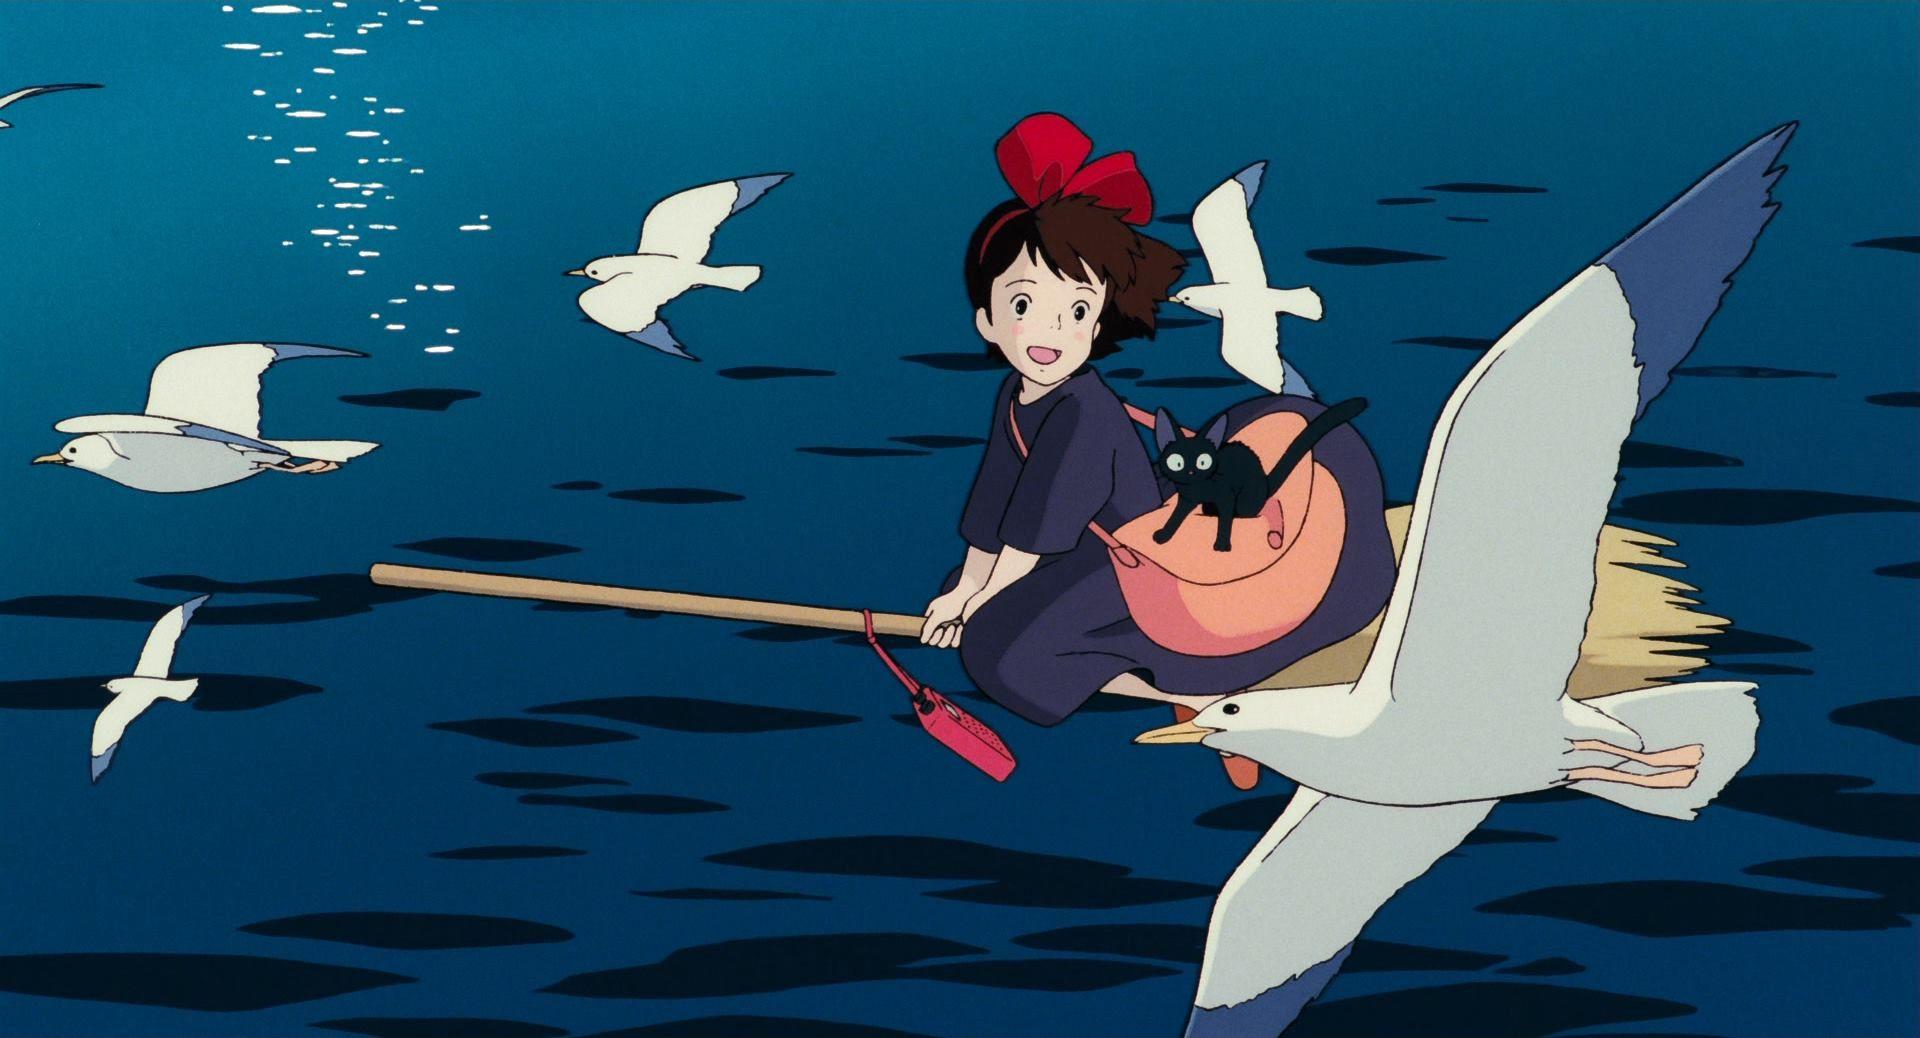 Pin by Steamboat Willie on Anime/Manga (アニメ / 漫画) Studio